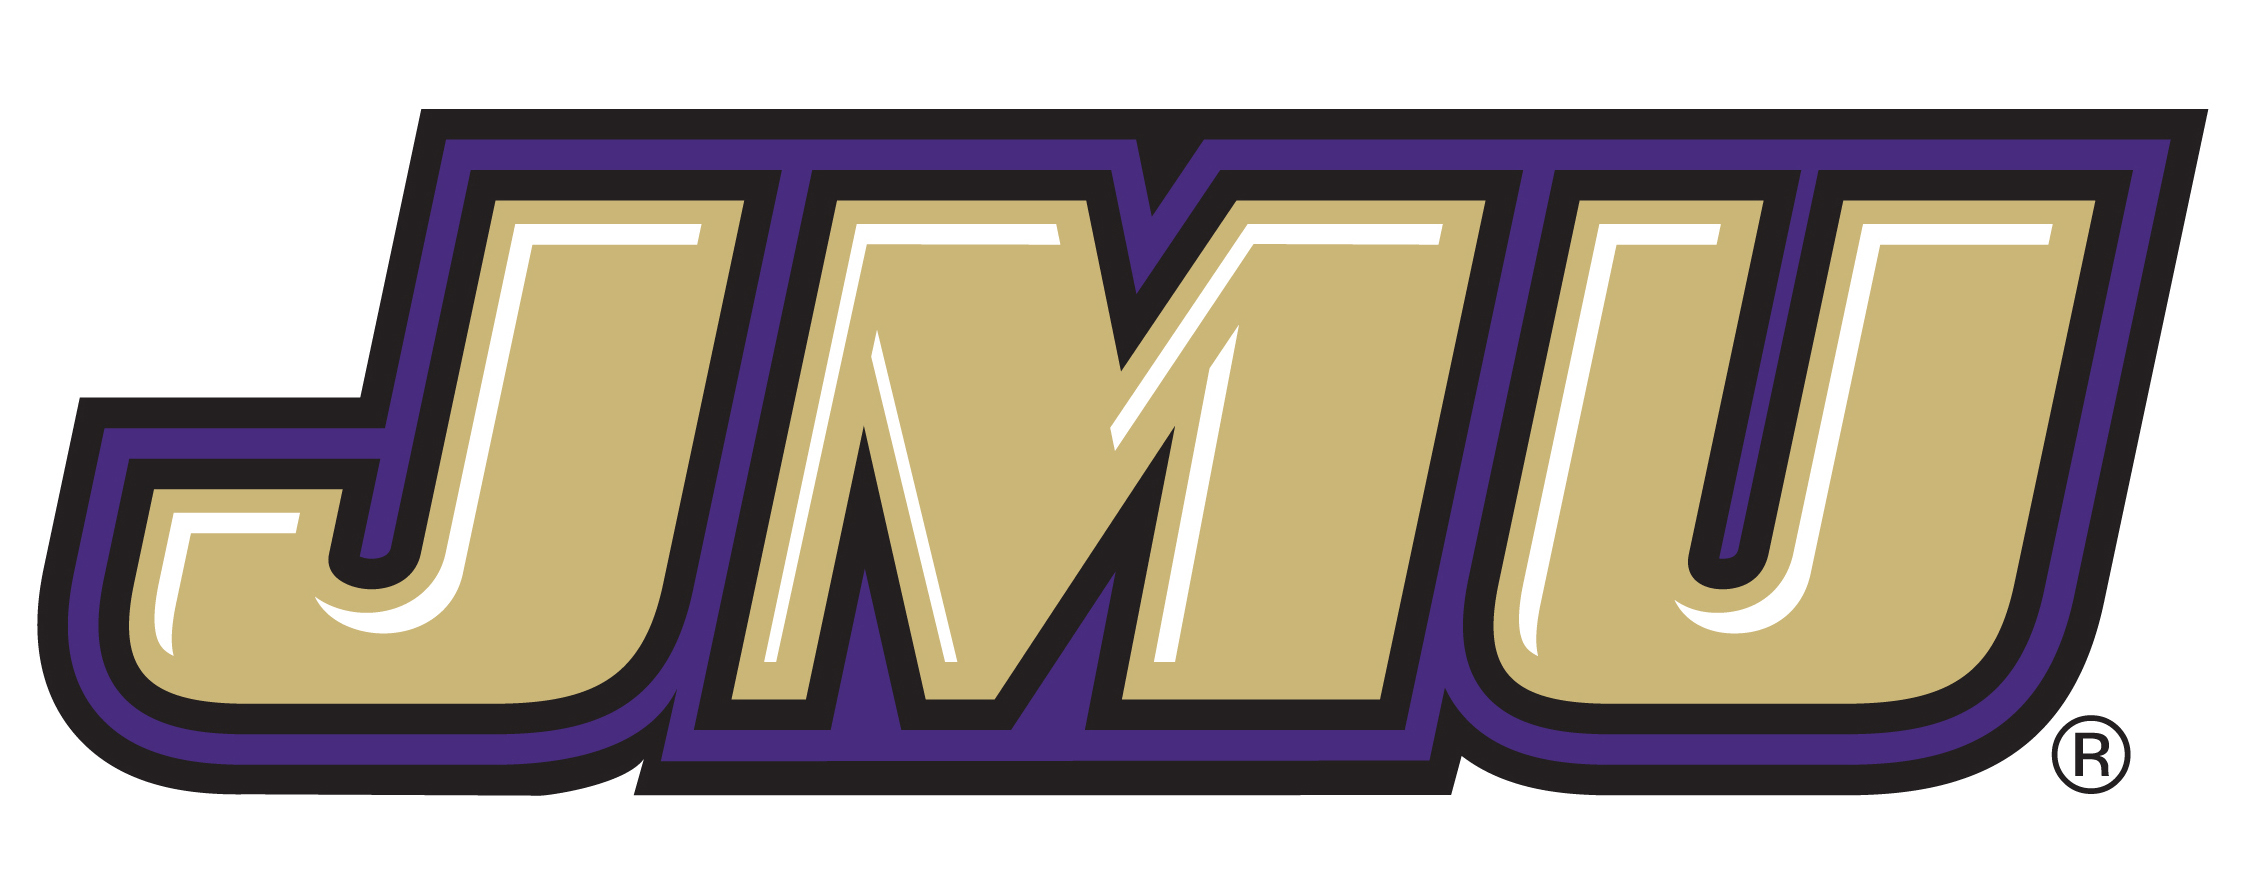 james madison university logo update sports logos